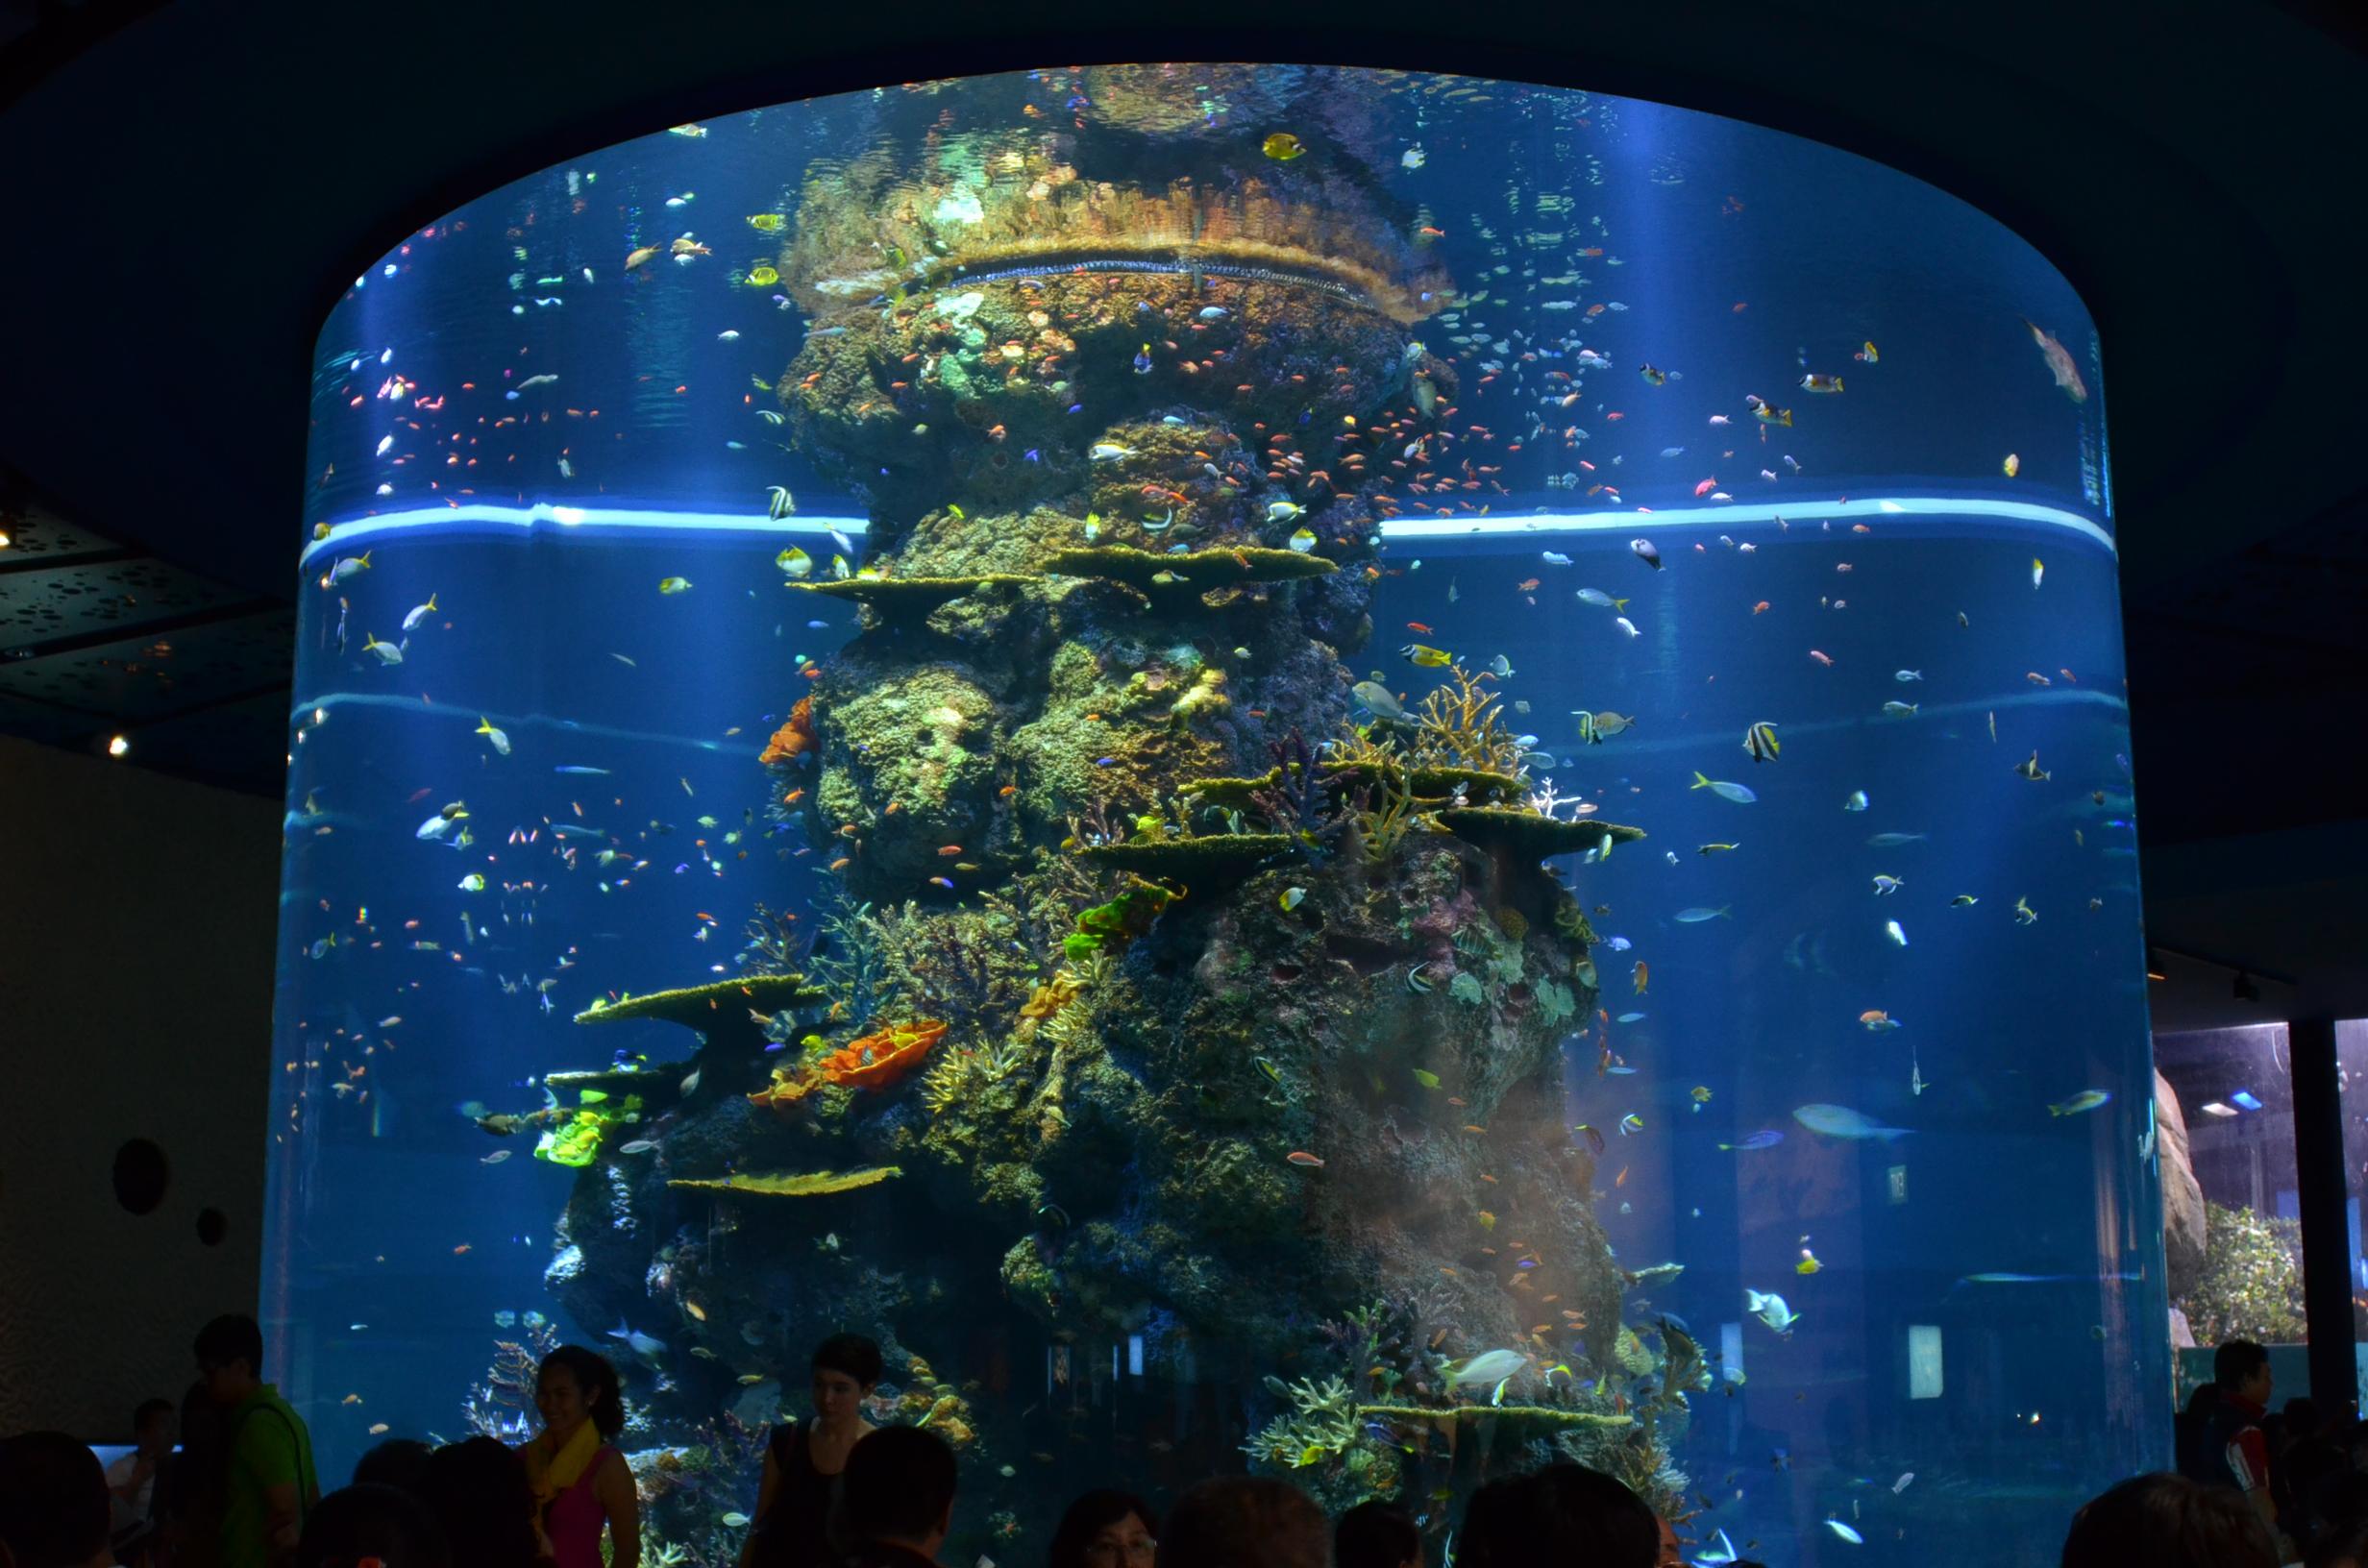 LED-Lighting-for-Public-Aquarium Stilvolle Bilder Mit Led Beleuchtung Dekorationen